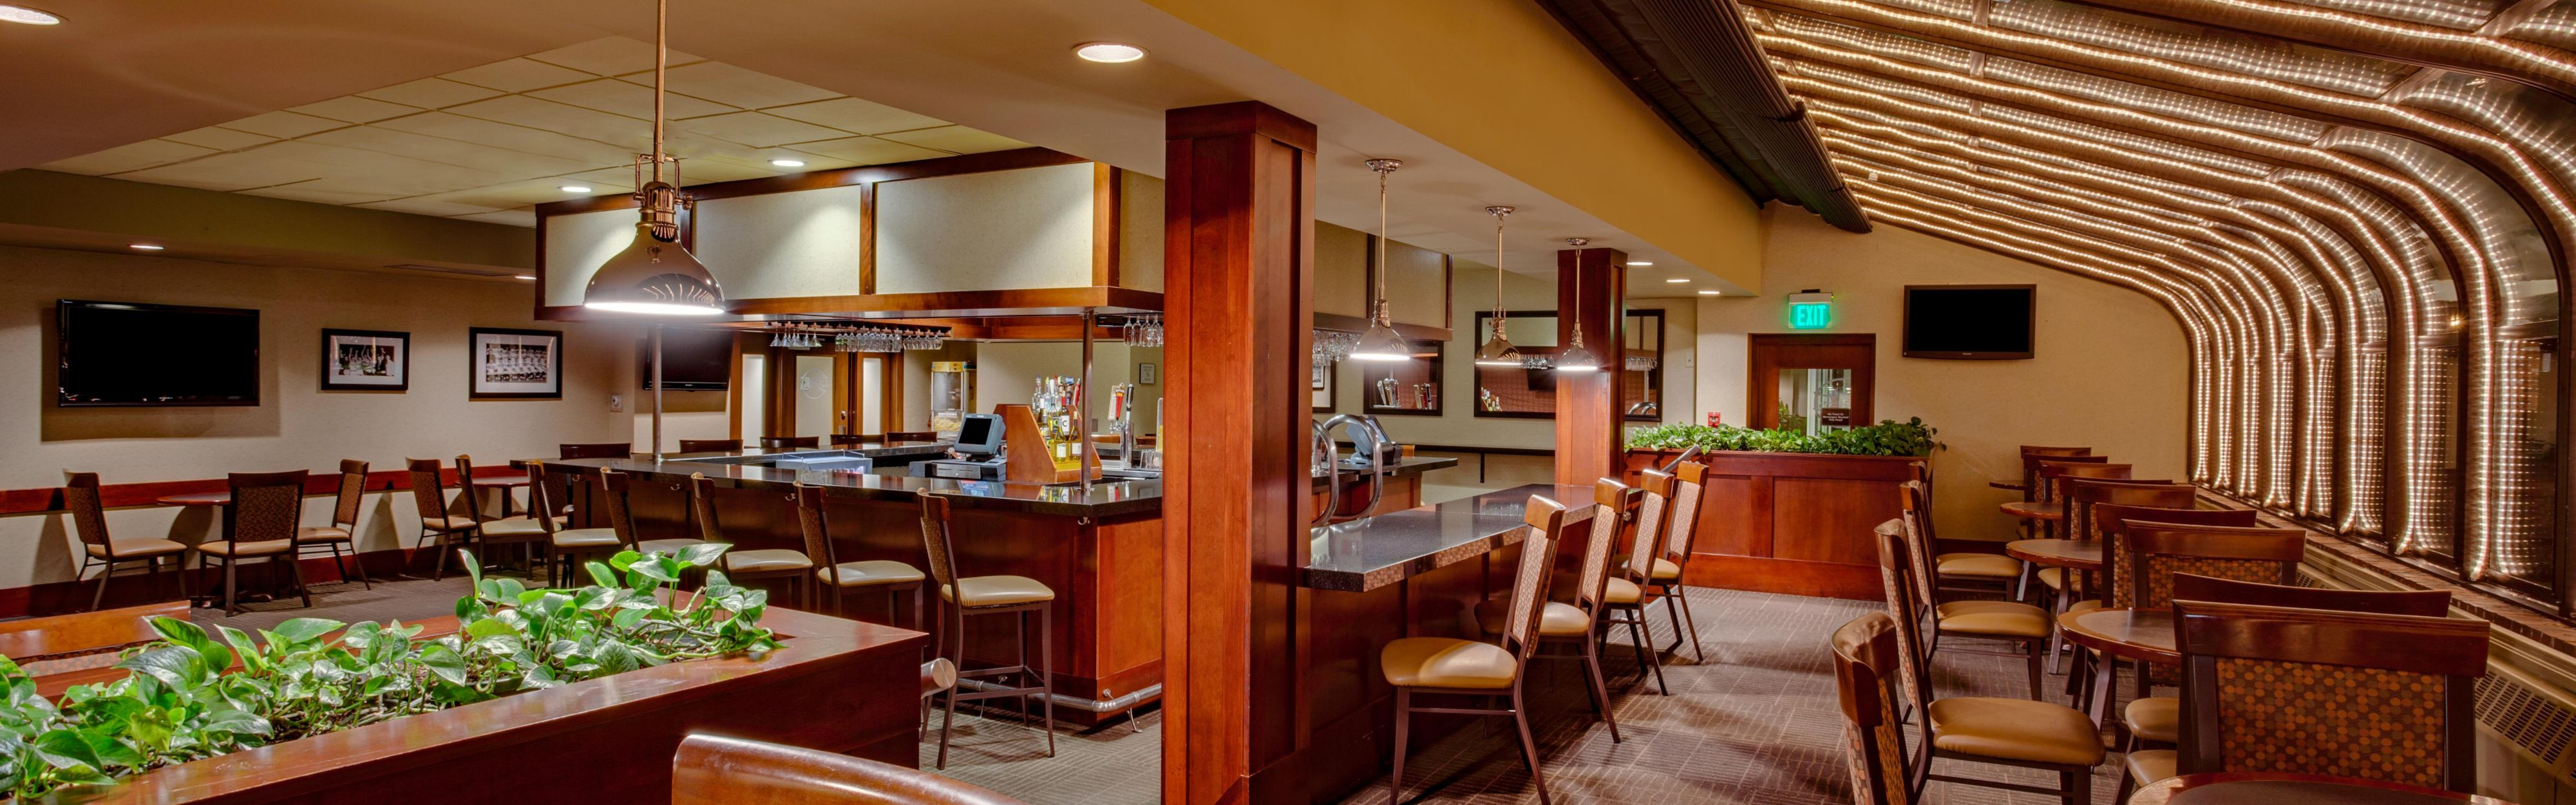 Holiday Inn Bangor | Phone 207-947-0101 | Bangor, ME, United States